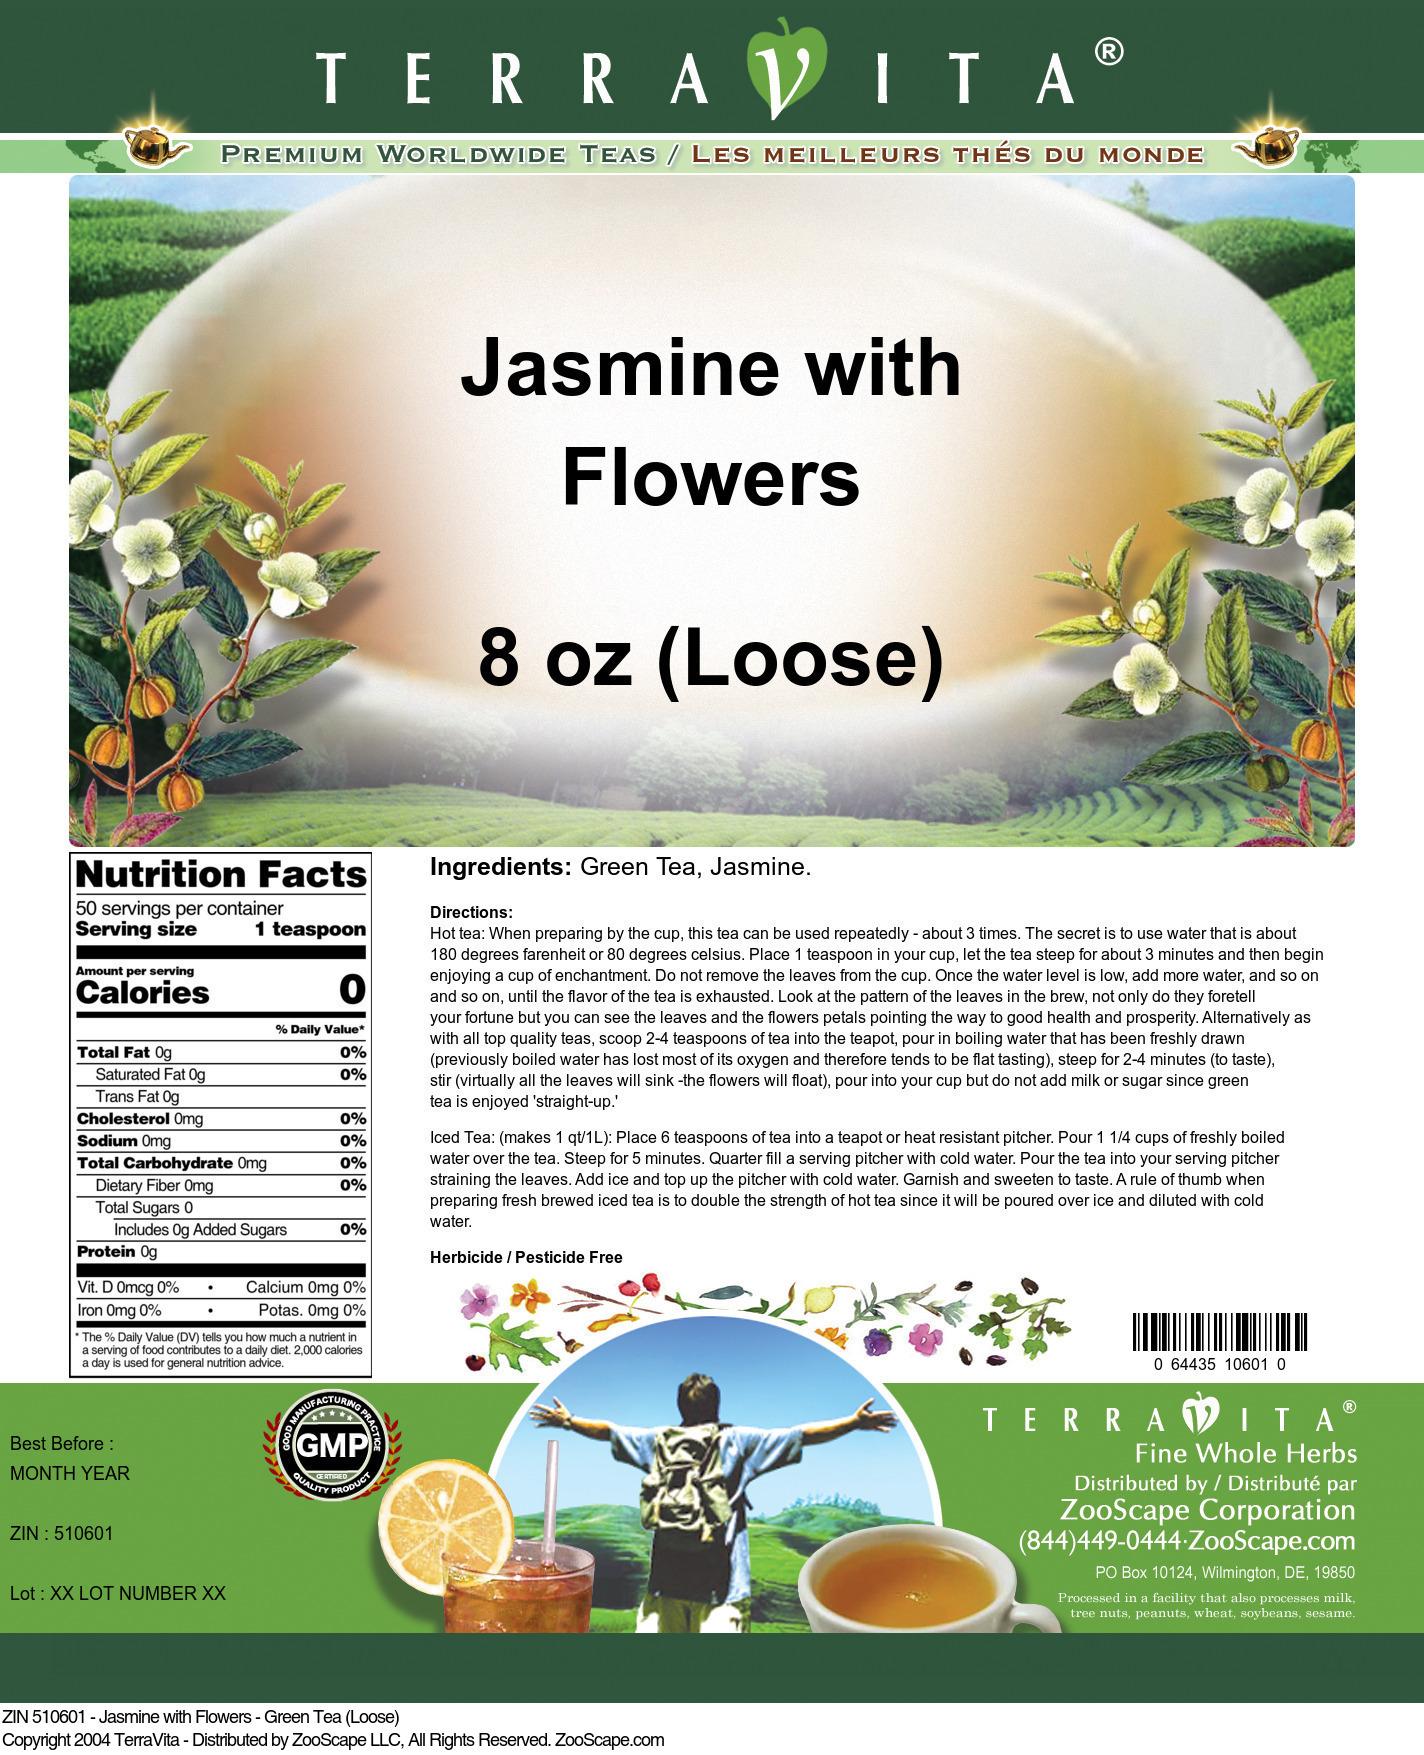 Jasmine with Flowers - Green Tea (Loose)